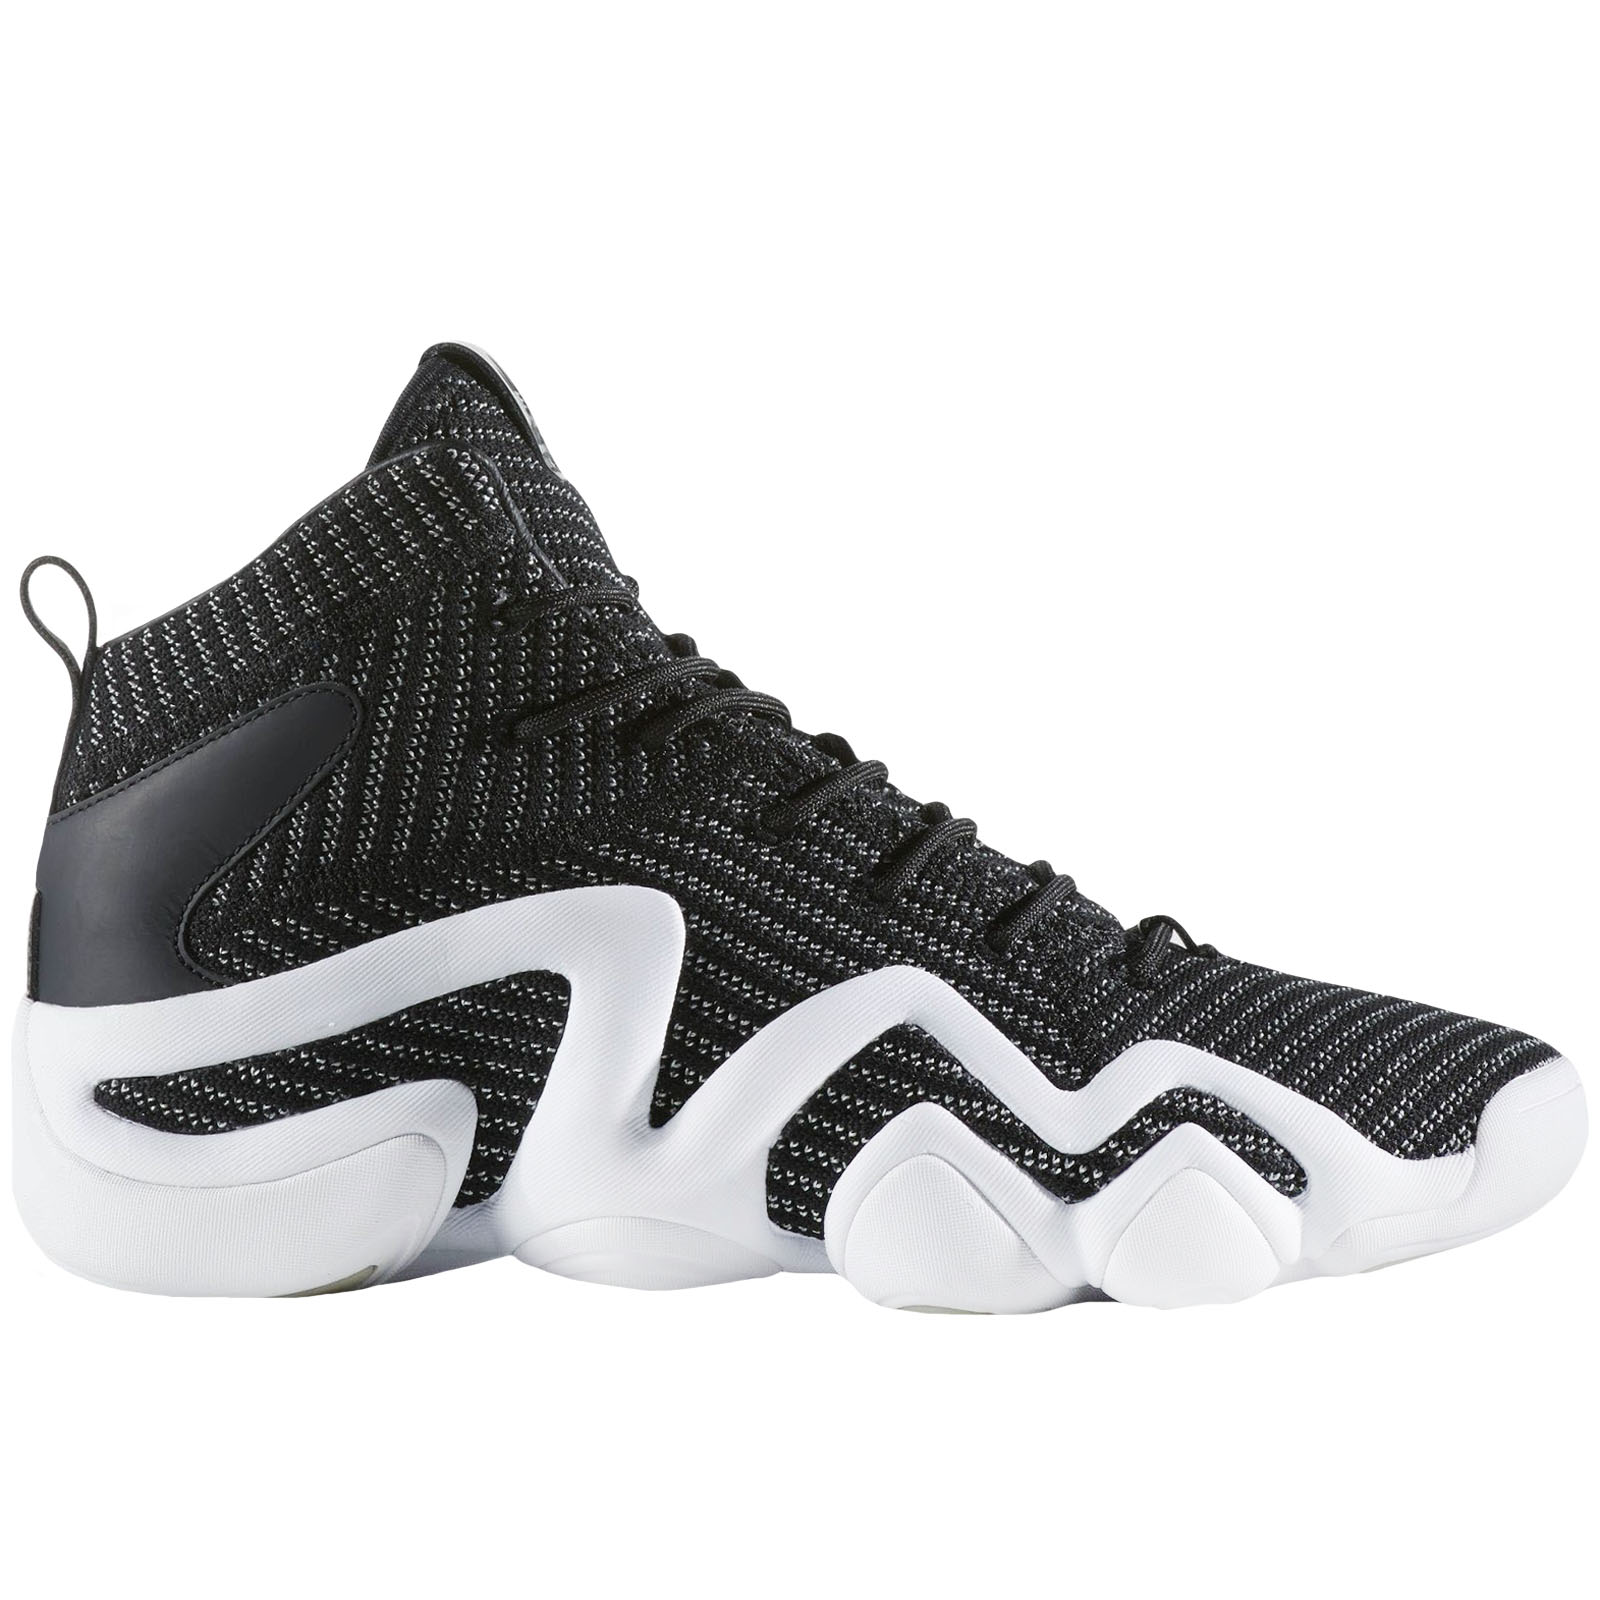 Schwarz Originals Crazy Schuhe Outlet | adidas